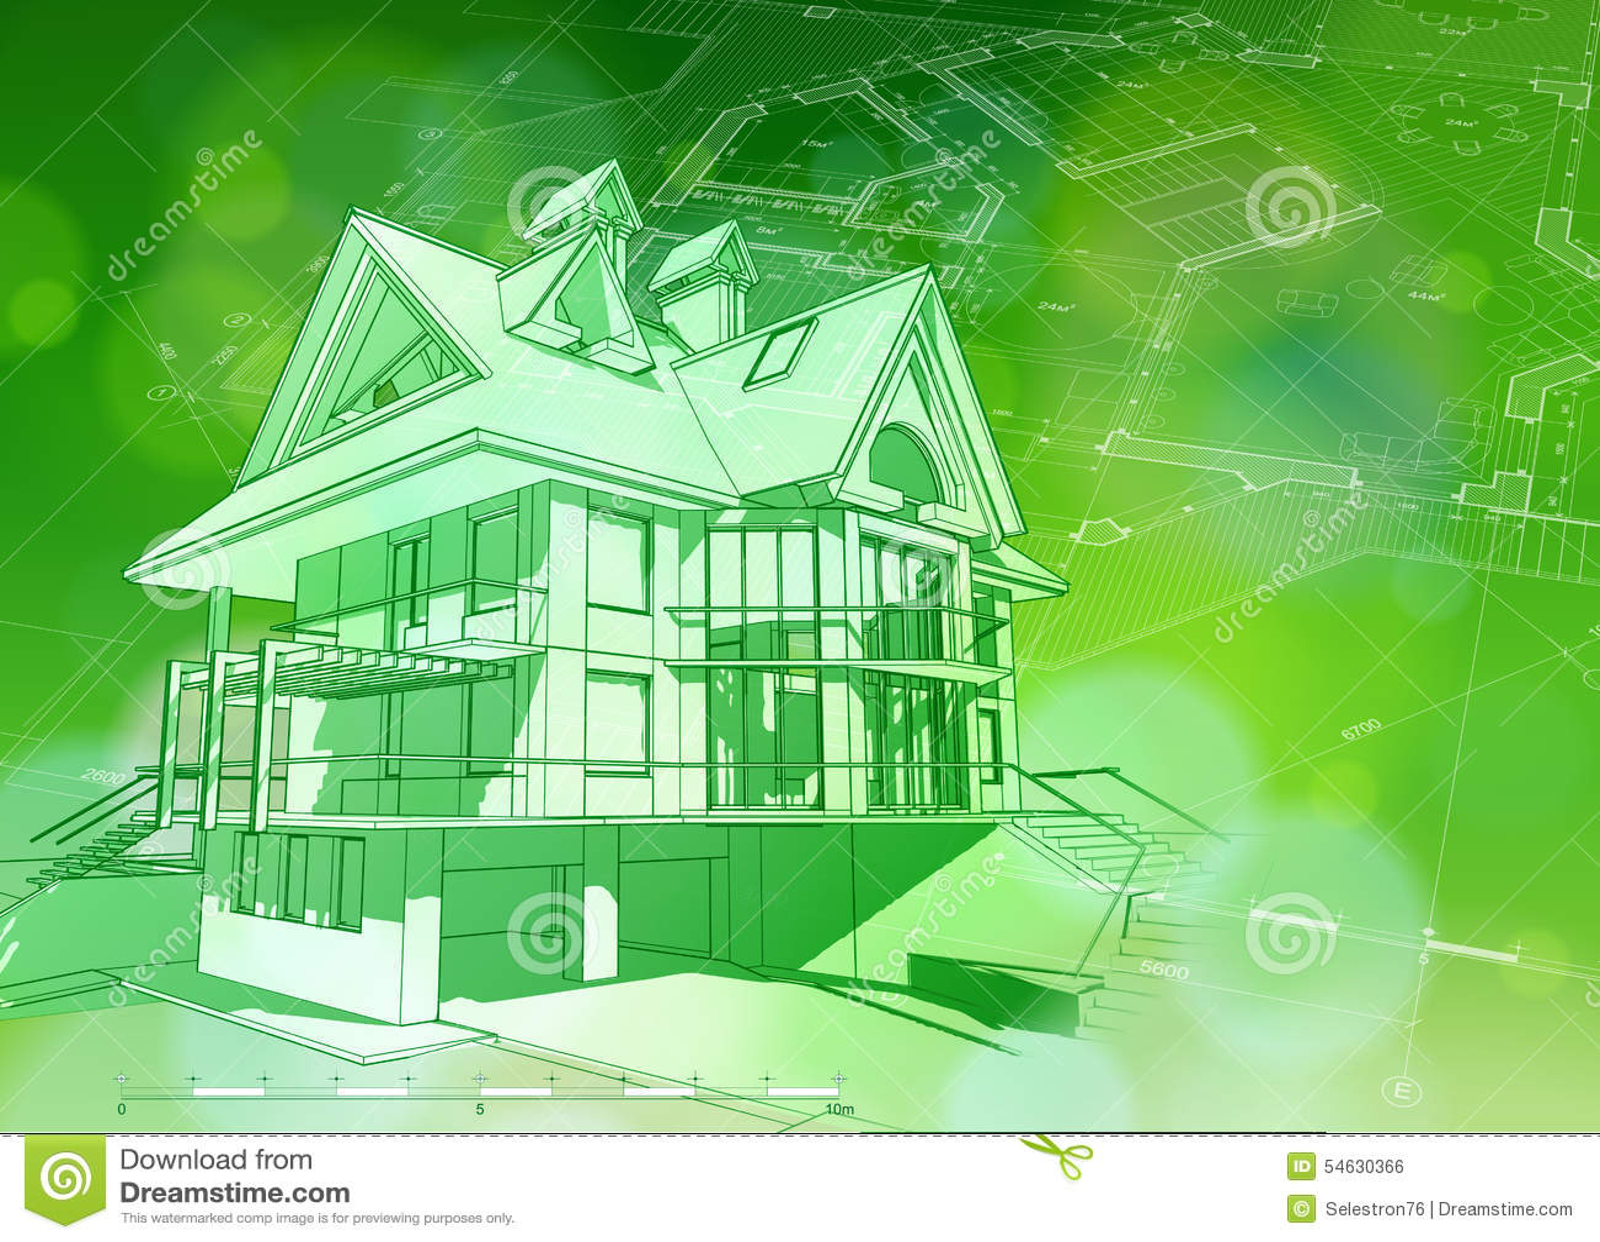 Blueprint 3d house plan green bokeh stock vector for Blueprint house design free